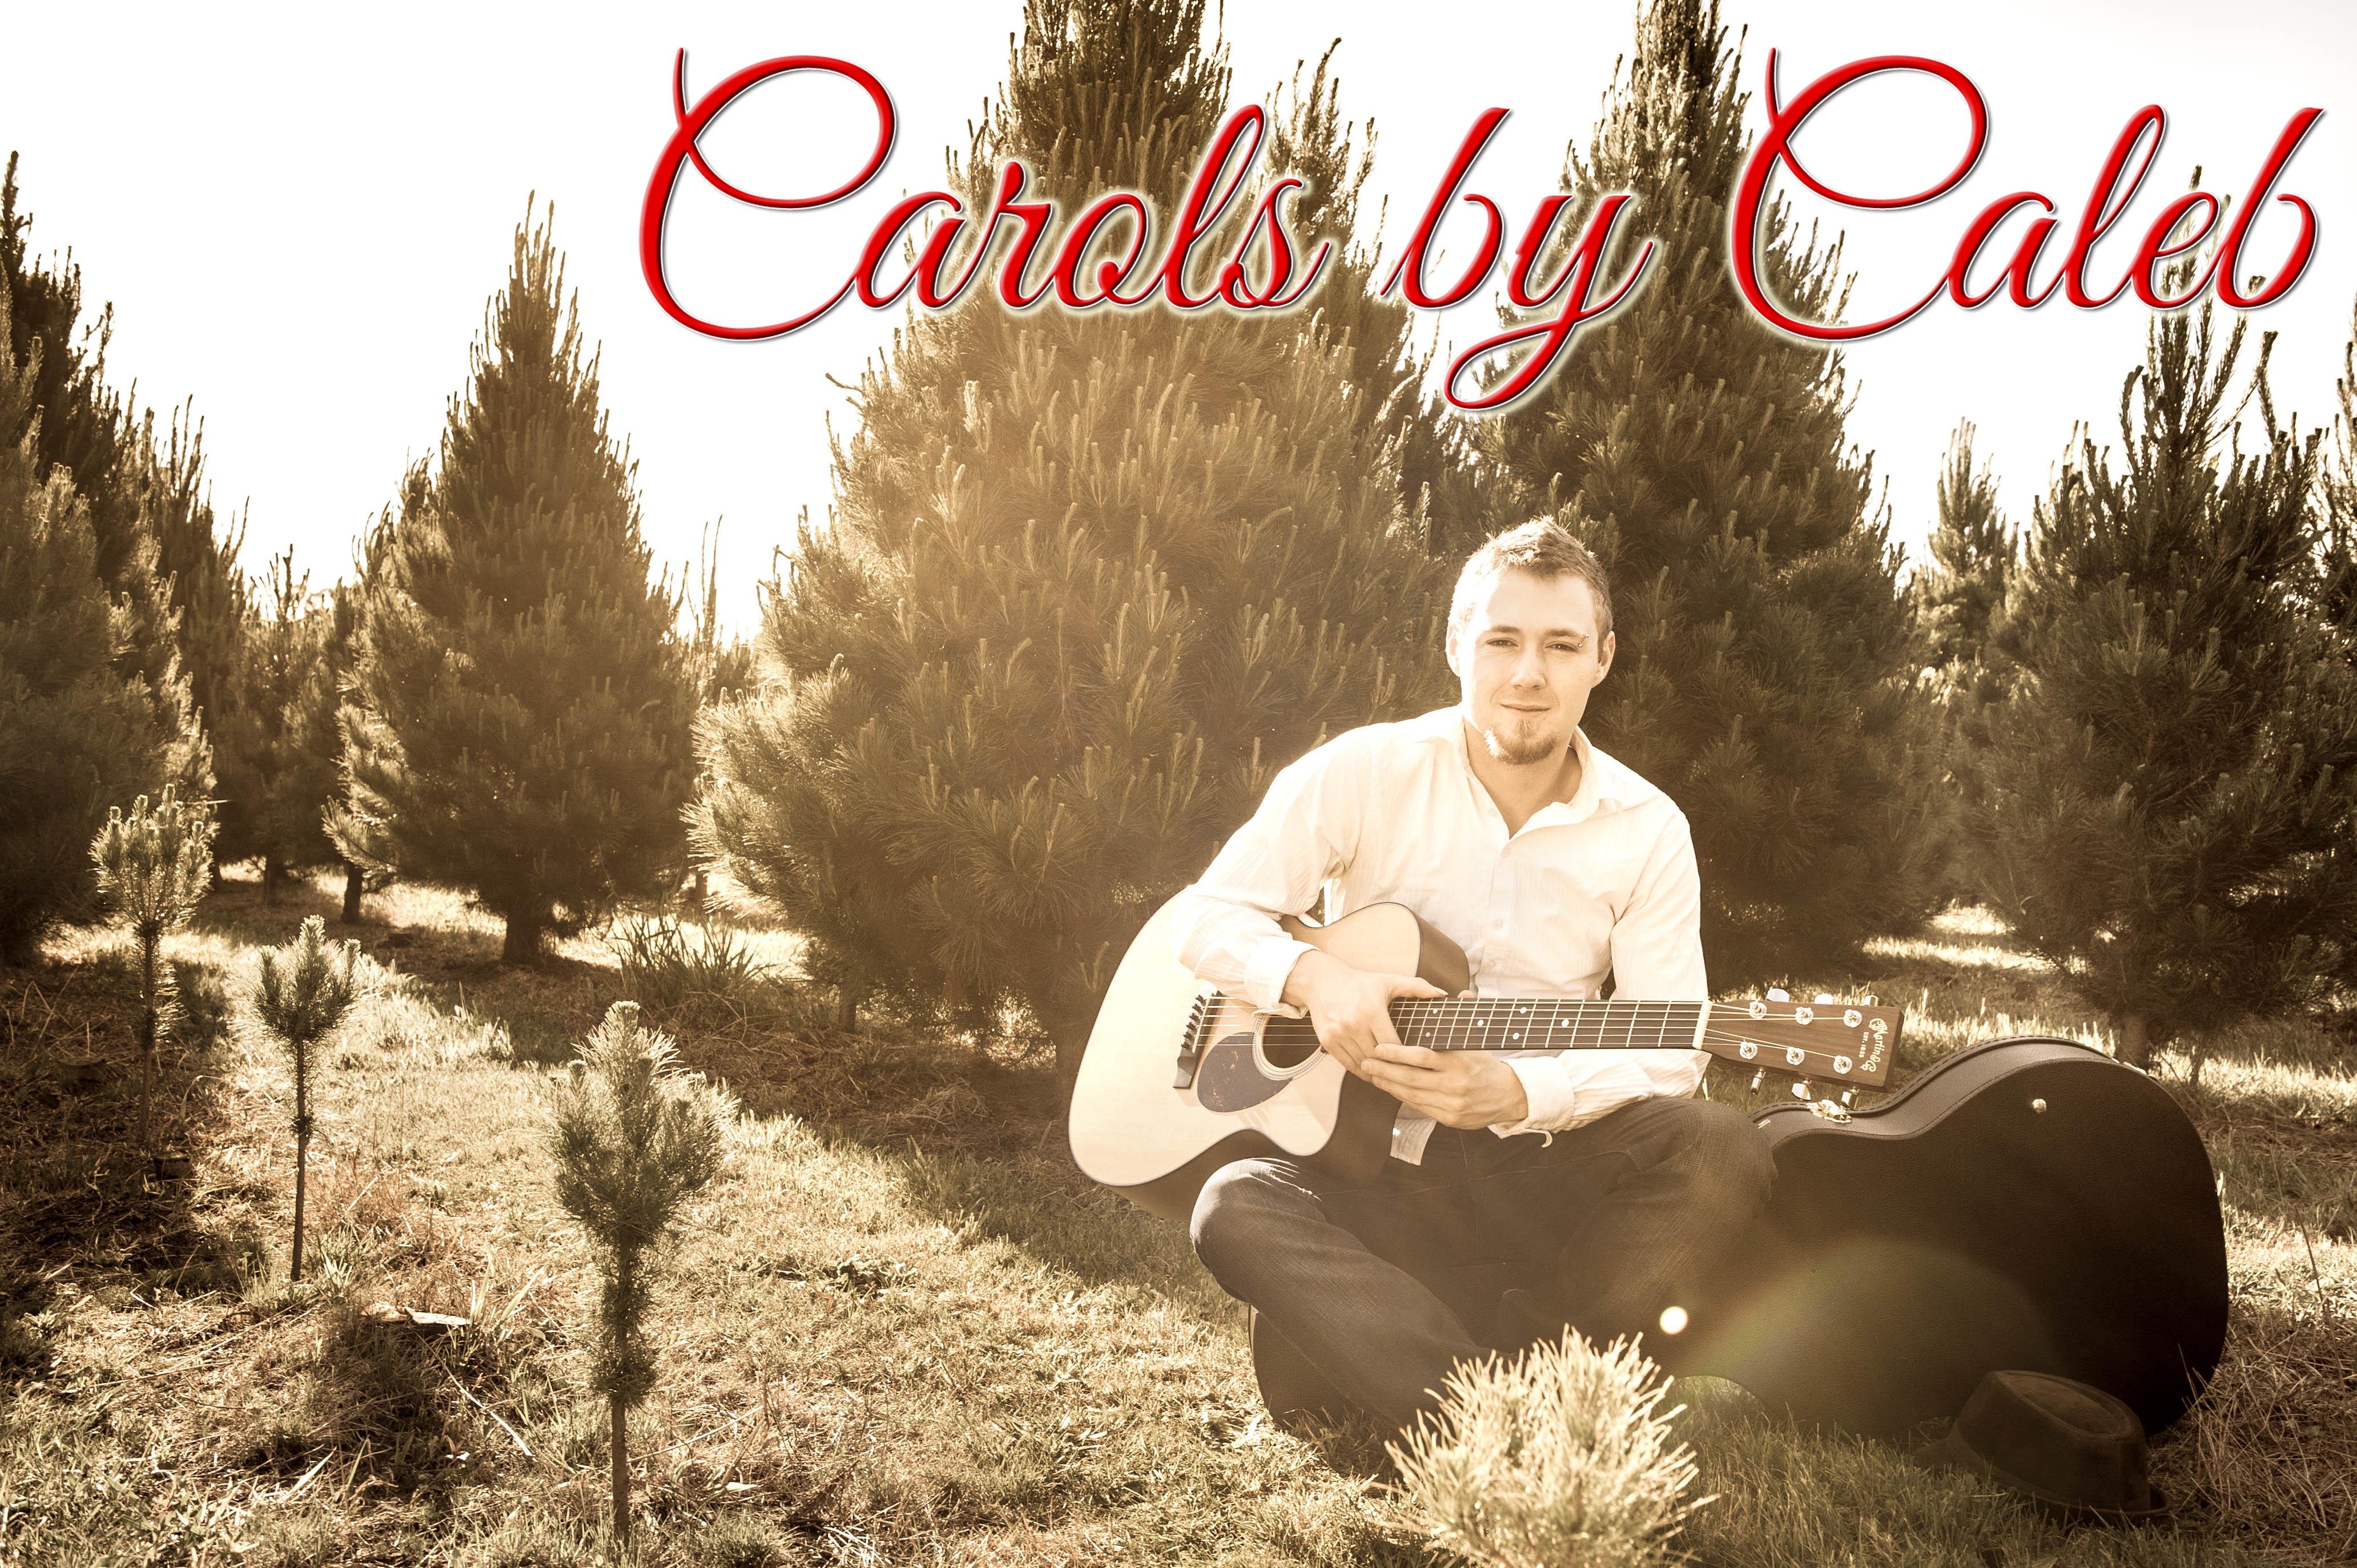 Carols by Caleb 2014